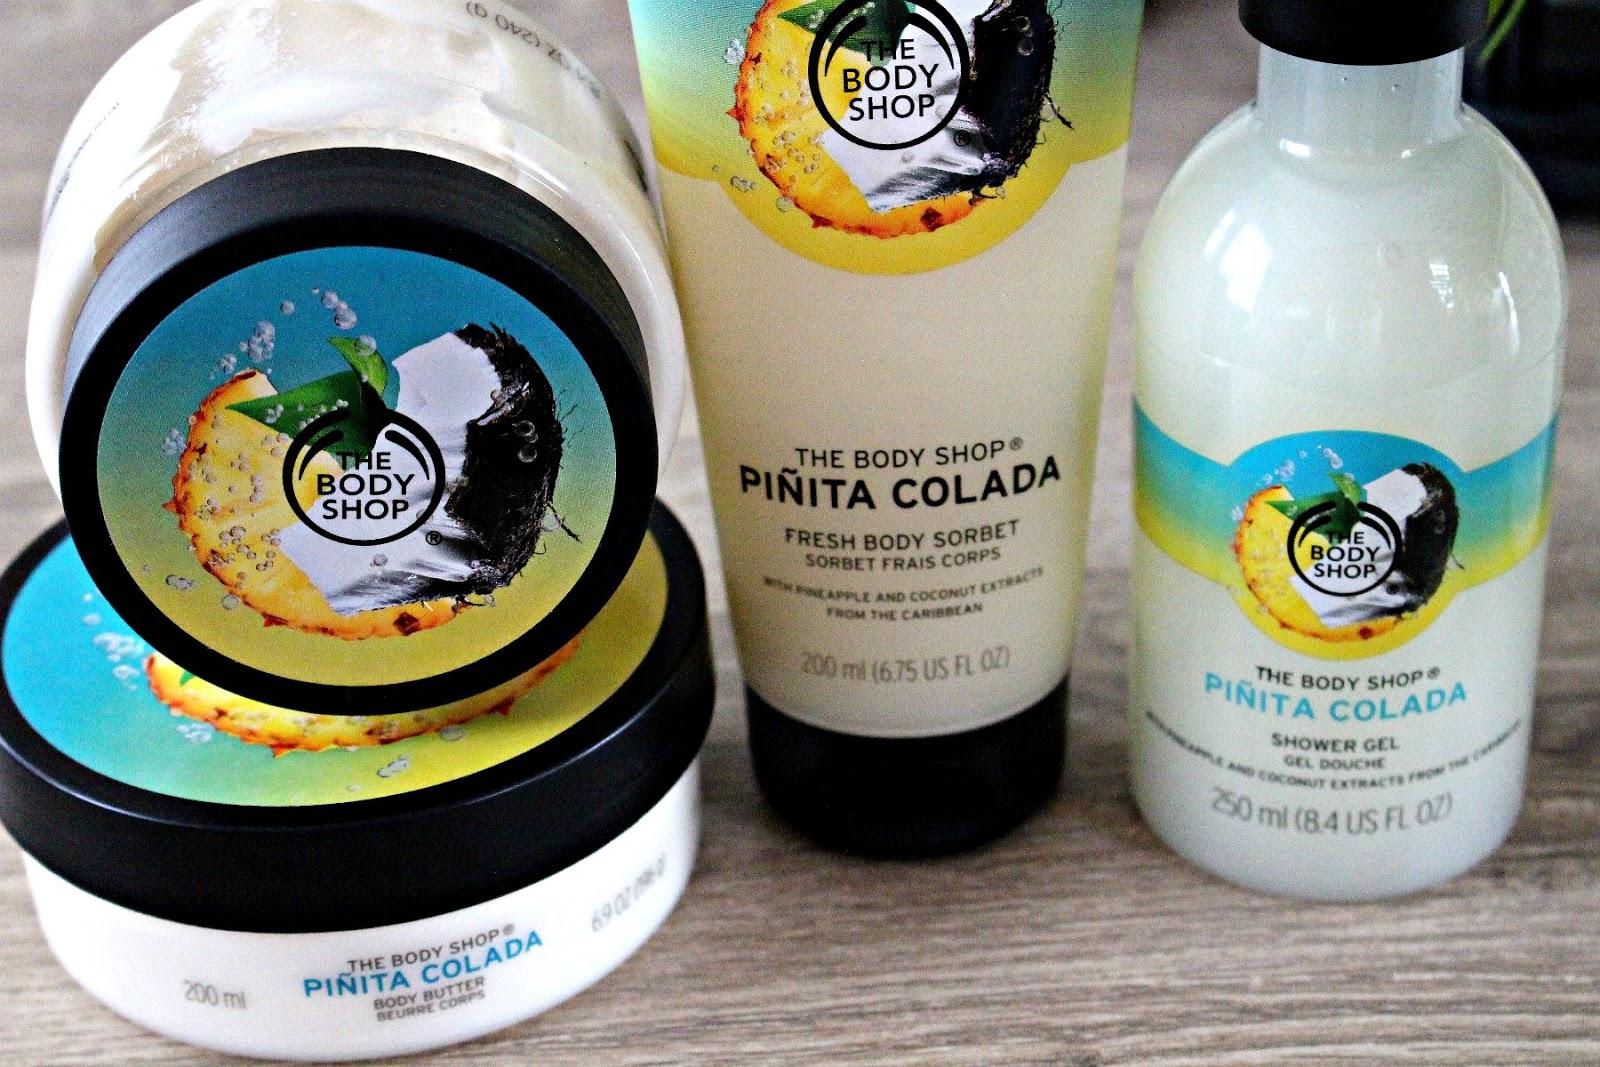 The Body Shop Pinita Colada